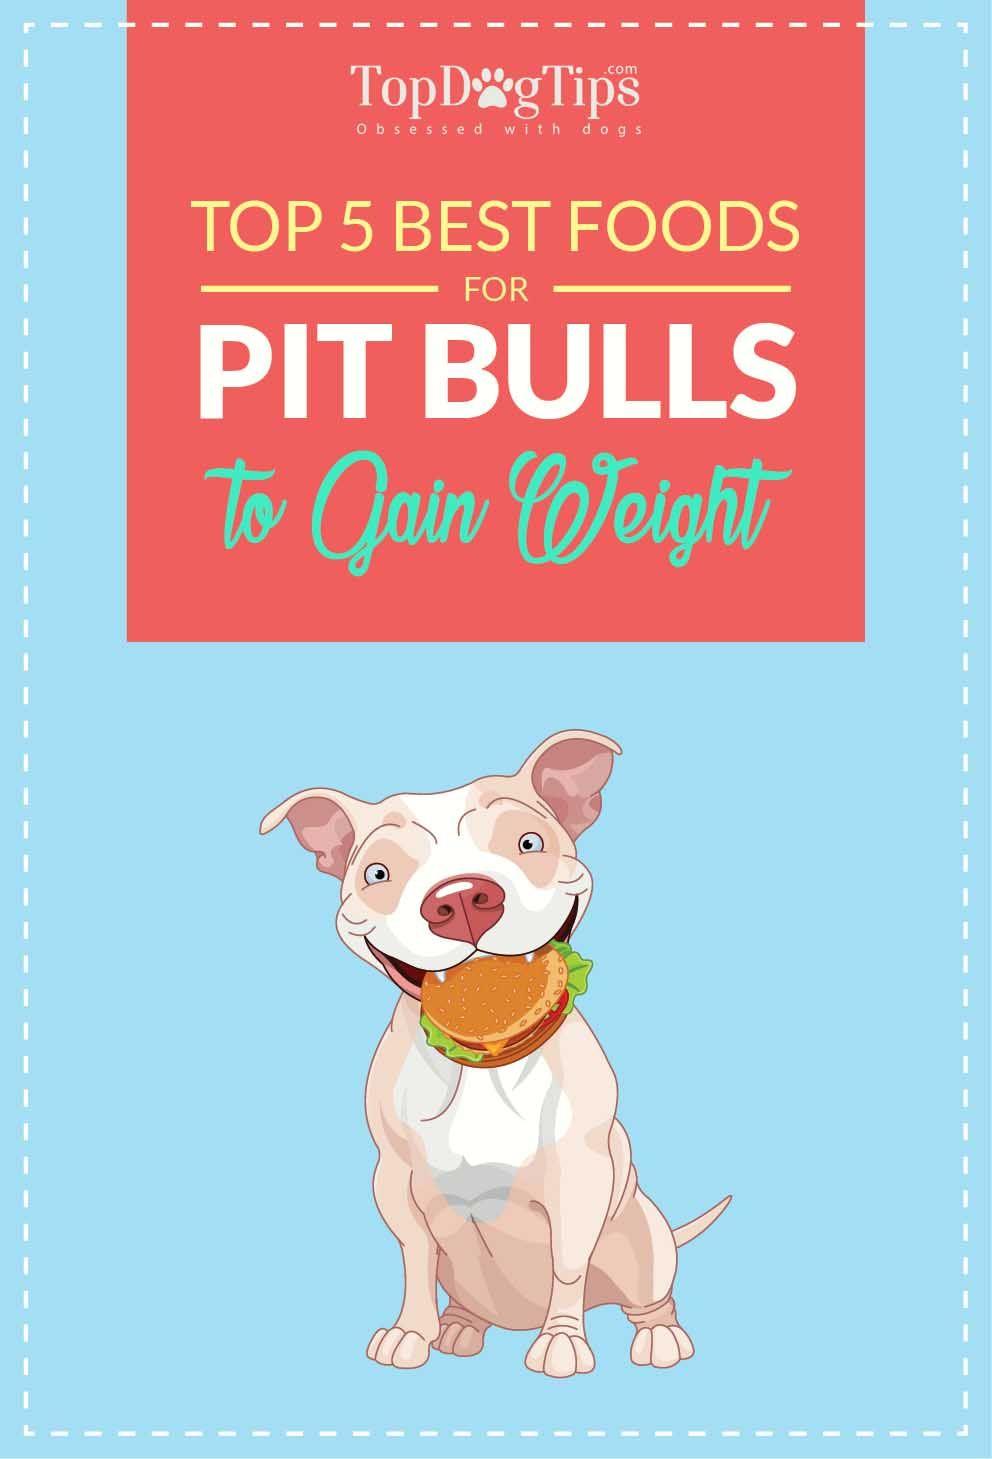 Best Dog Food To Make Pitbull Gain Weight